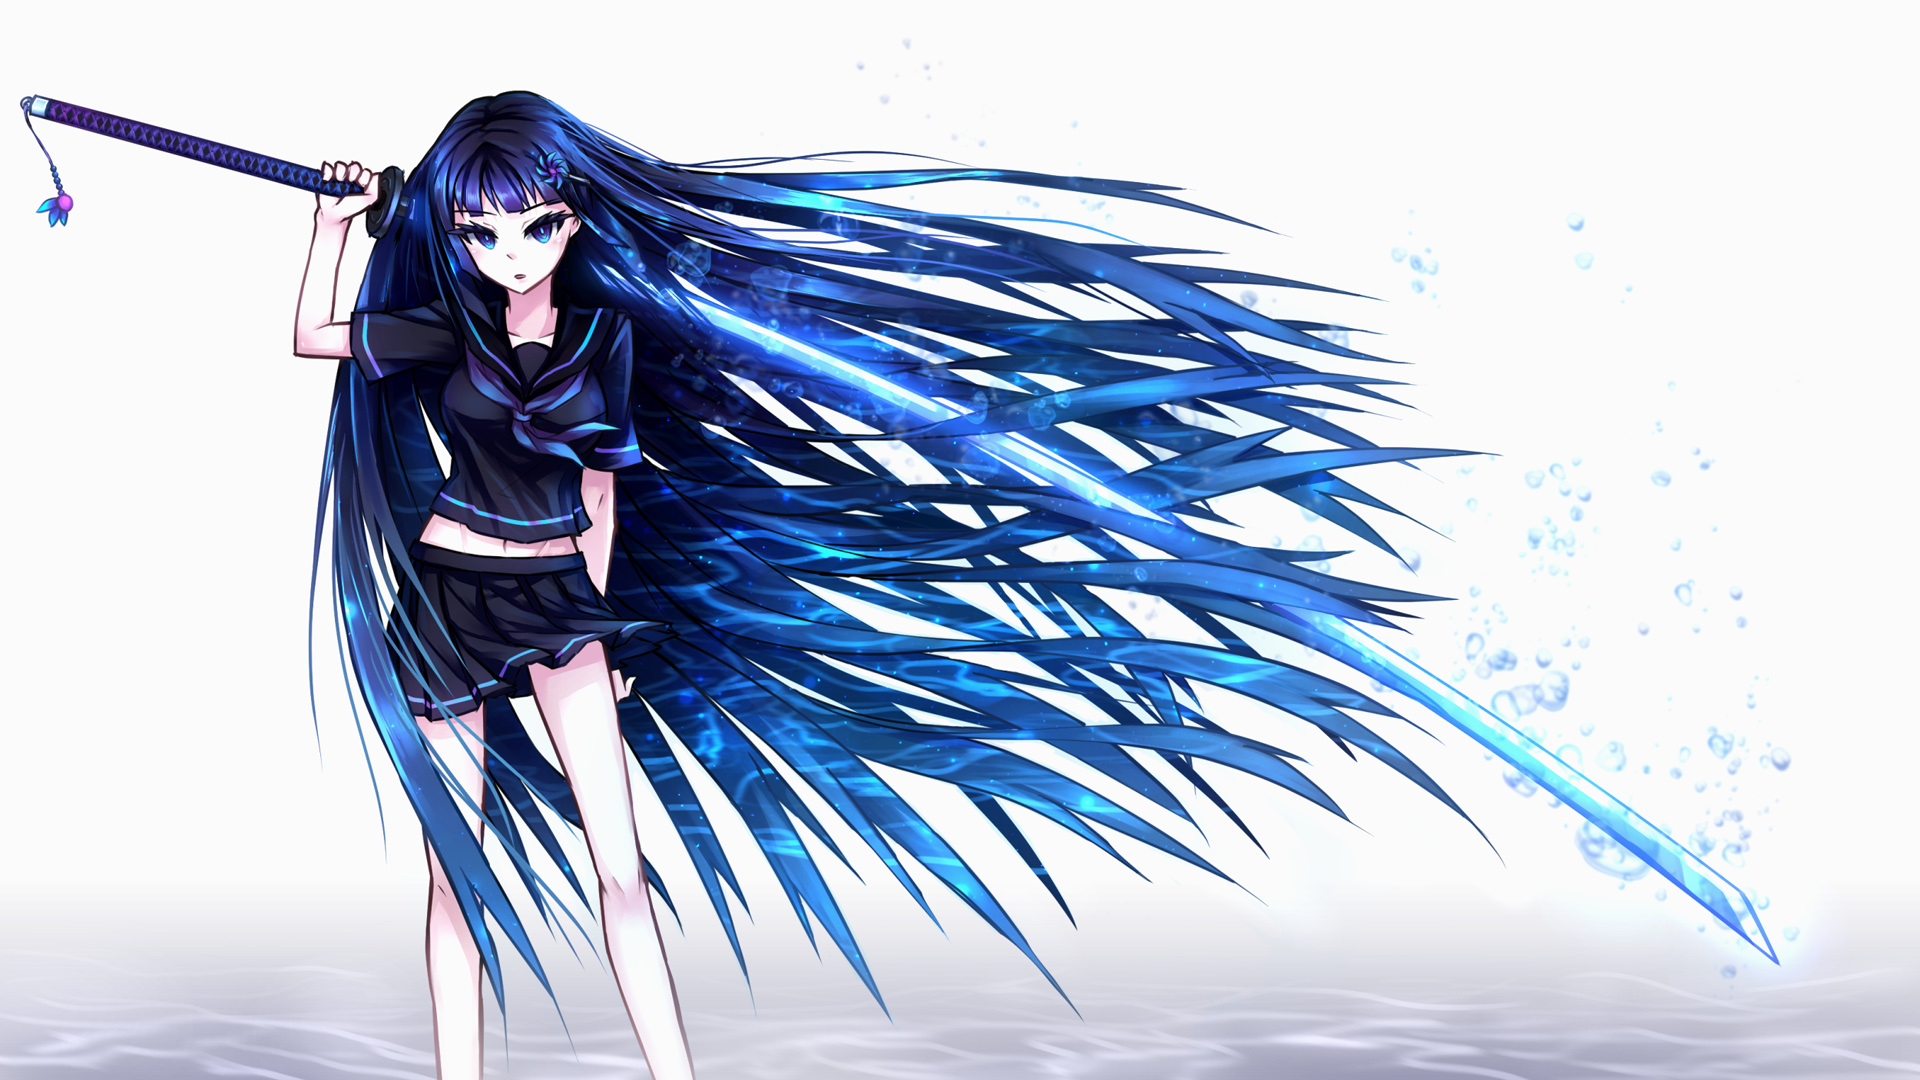 Tesla world of cresea wiki fandom powered by wikia - Girl with sword wallpaper ...